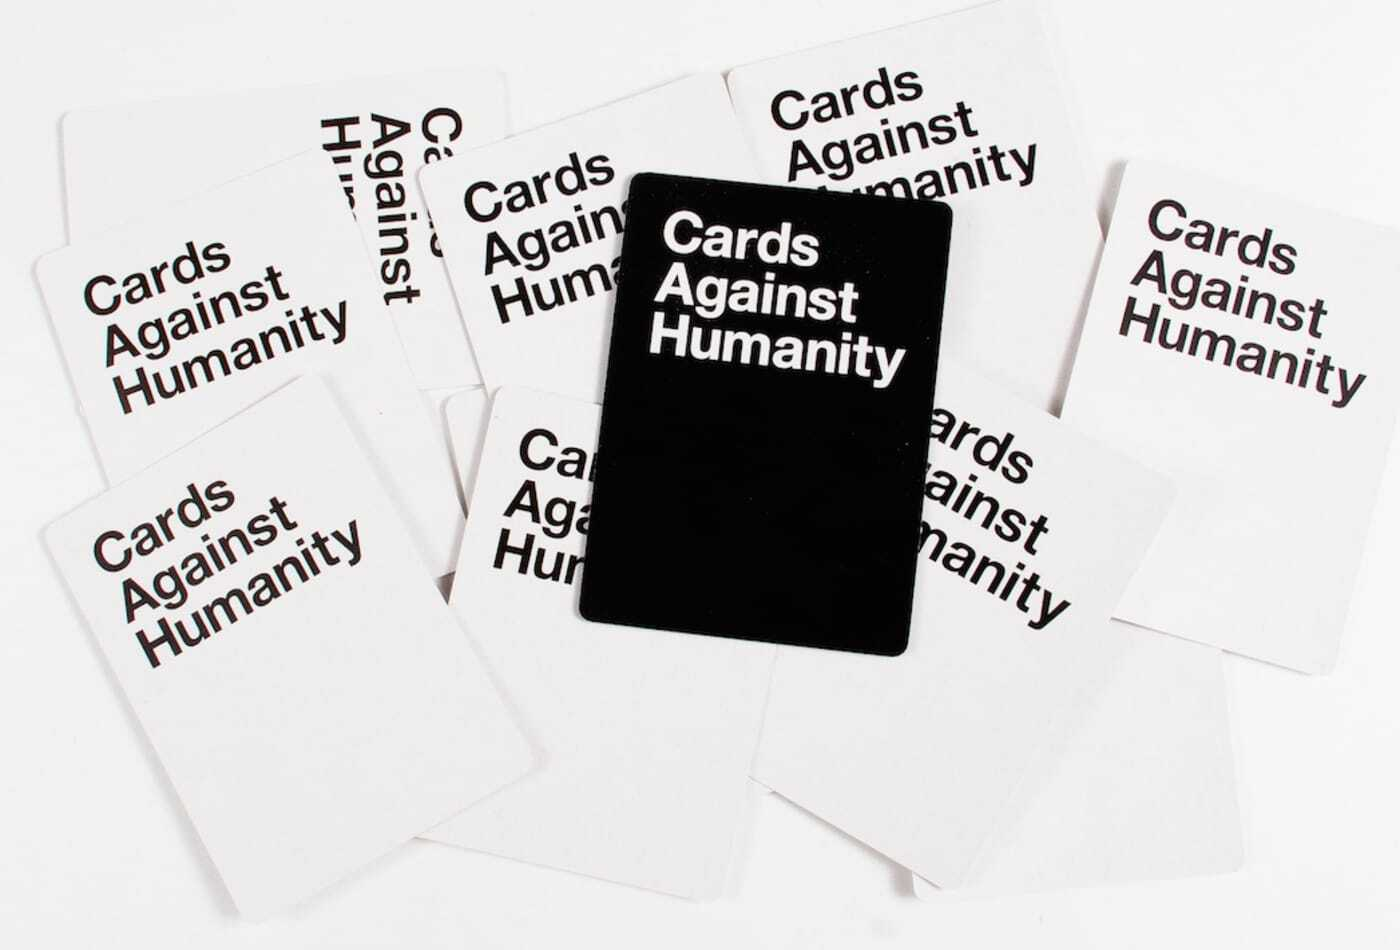 cards-against-humanity-antreprenori